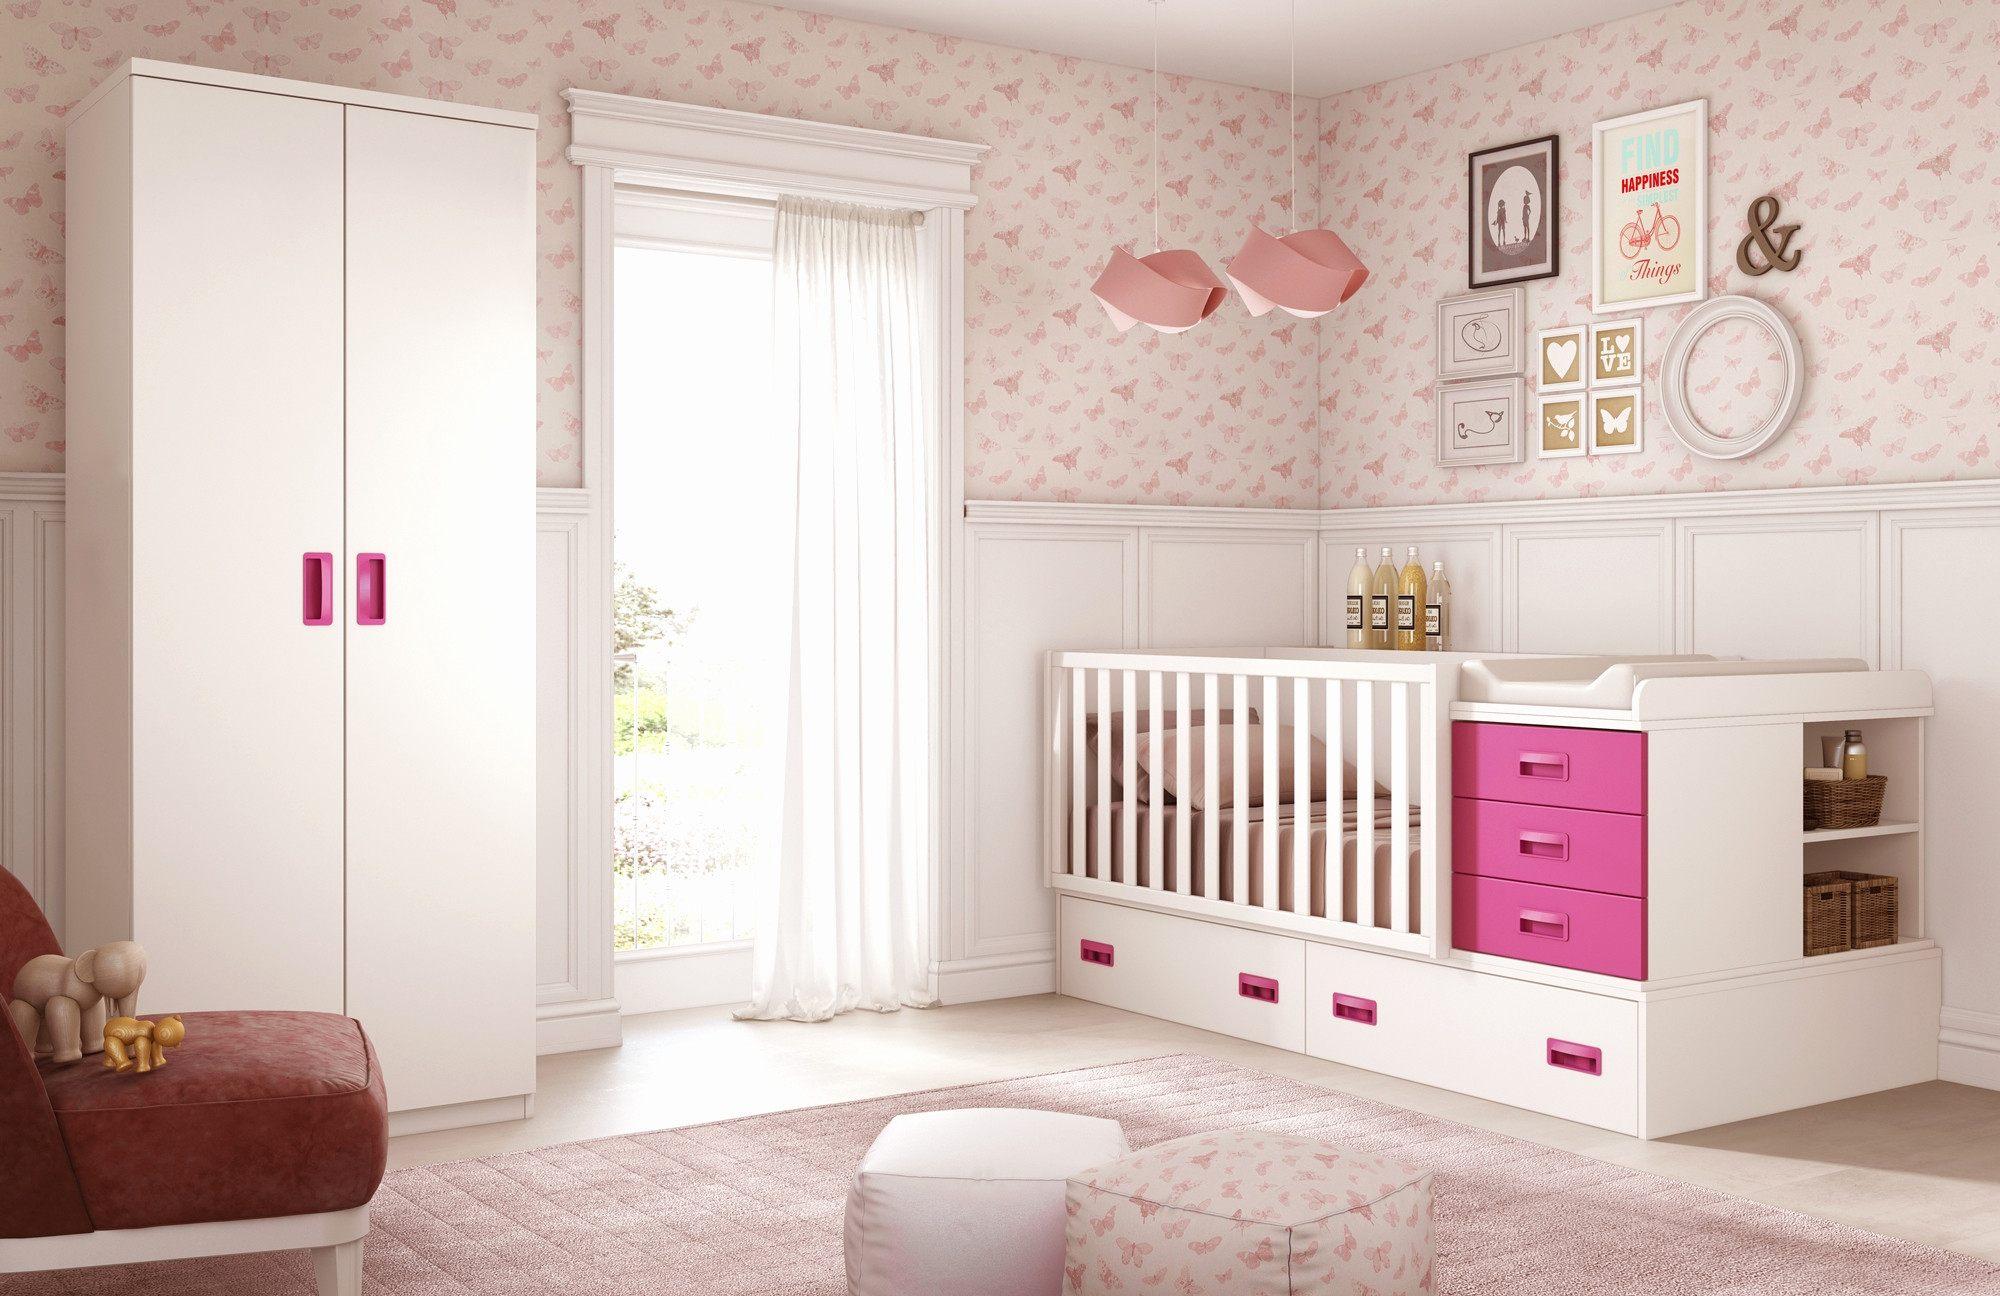 Lit Bebe Pliable Luxe Lit Bebe Jusqu A Quel Age Chambre Evolutive Génial Bebe Chambre